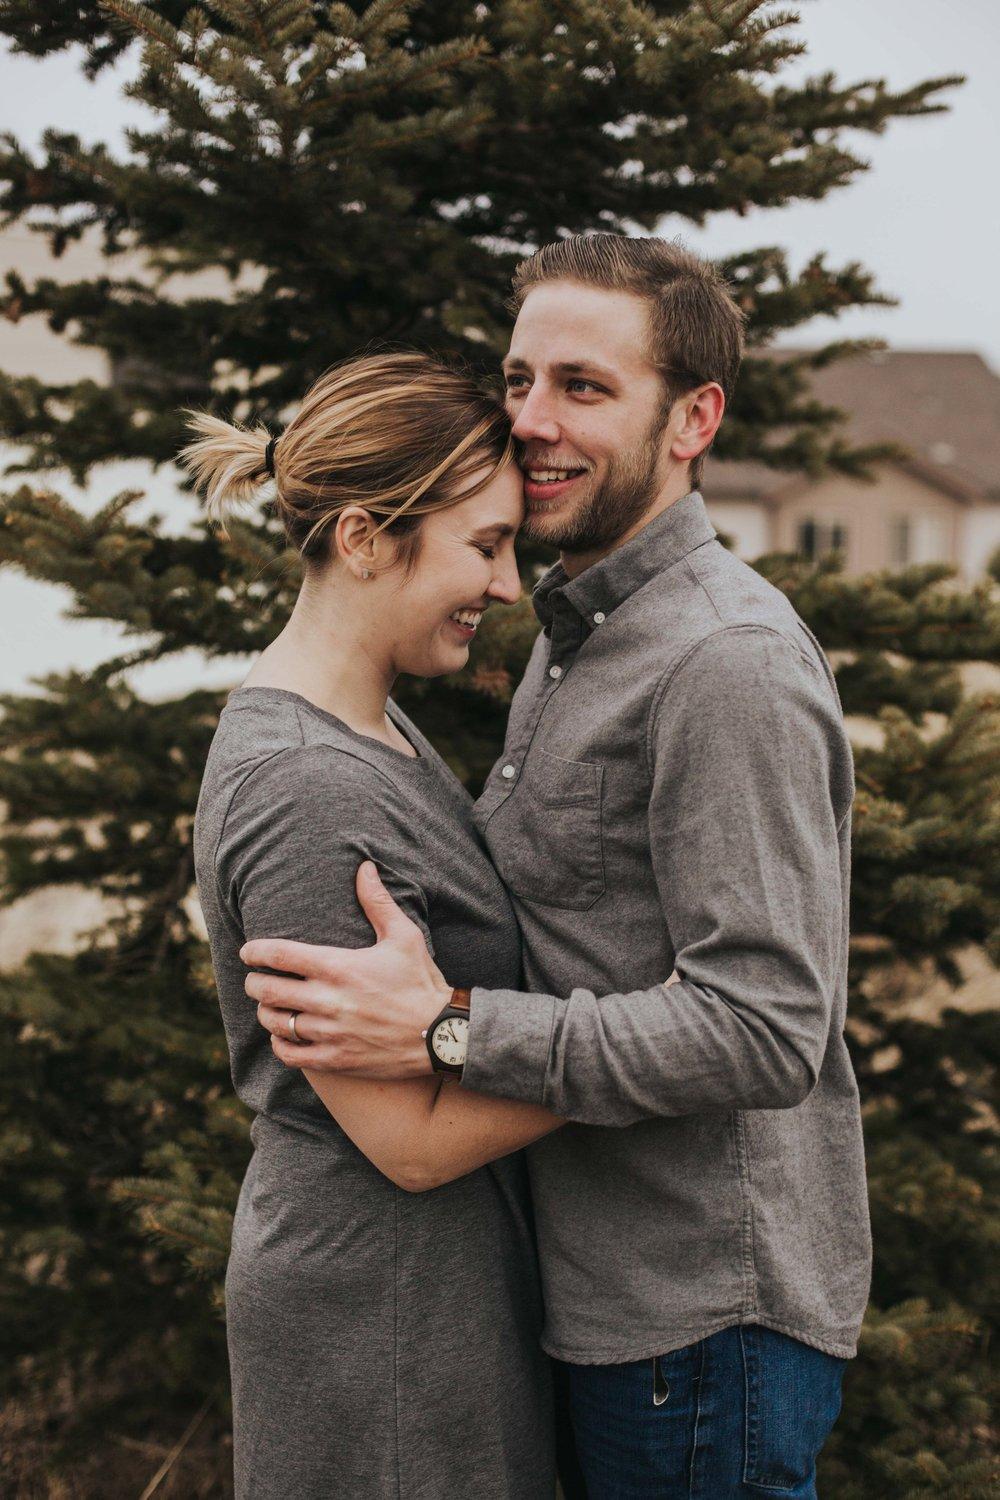 Colorado+Engagement+Photographer-Golden+Colorado+Photographer-Kat+Mike-17.jpg